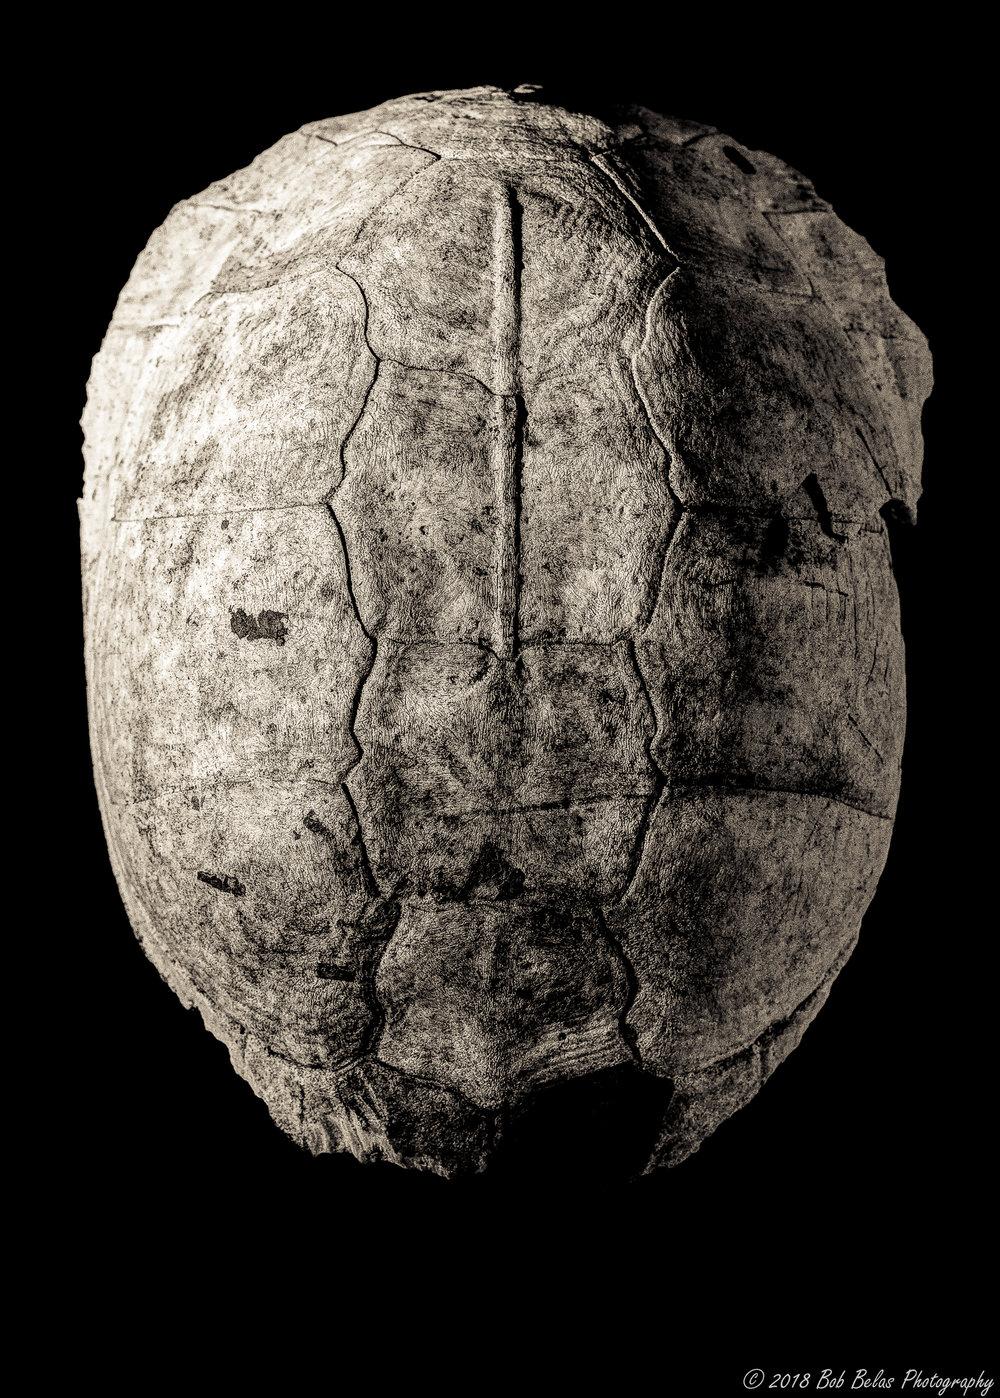 Turtle Shell, monochrome